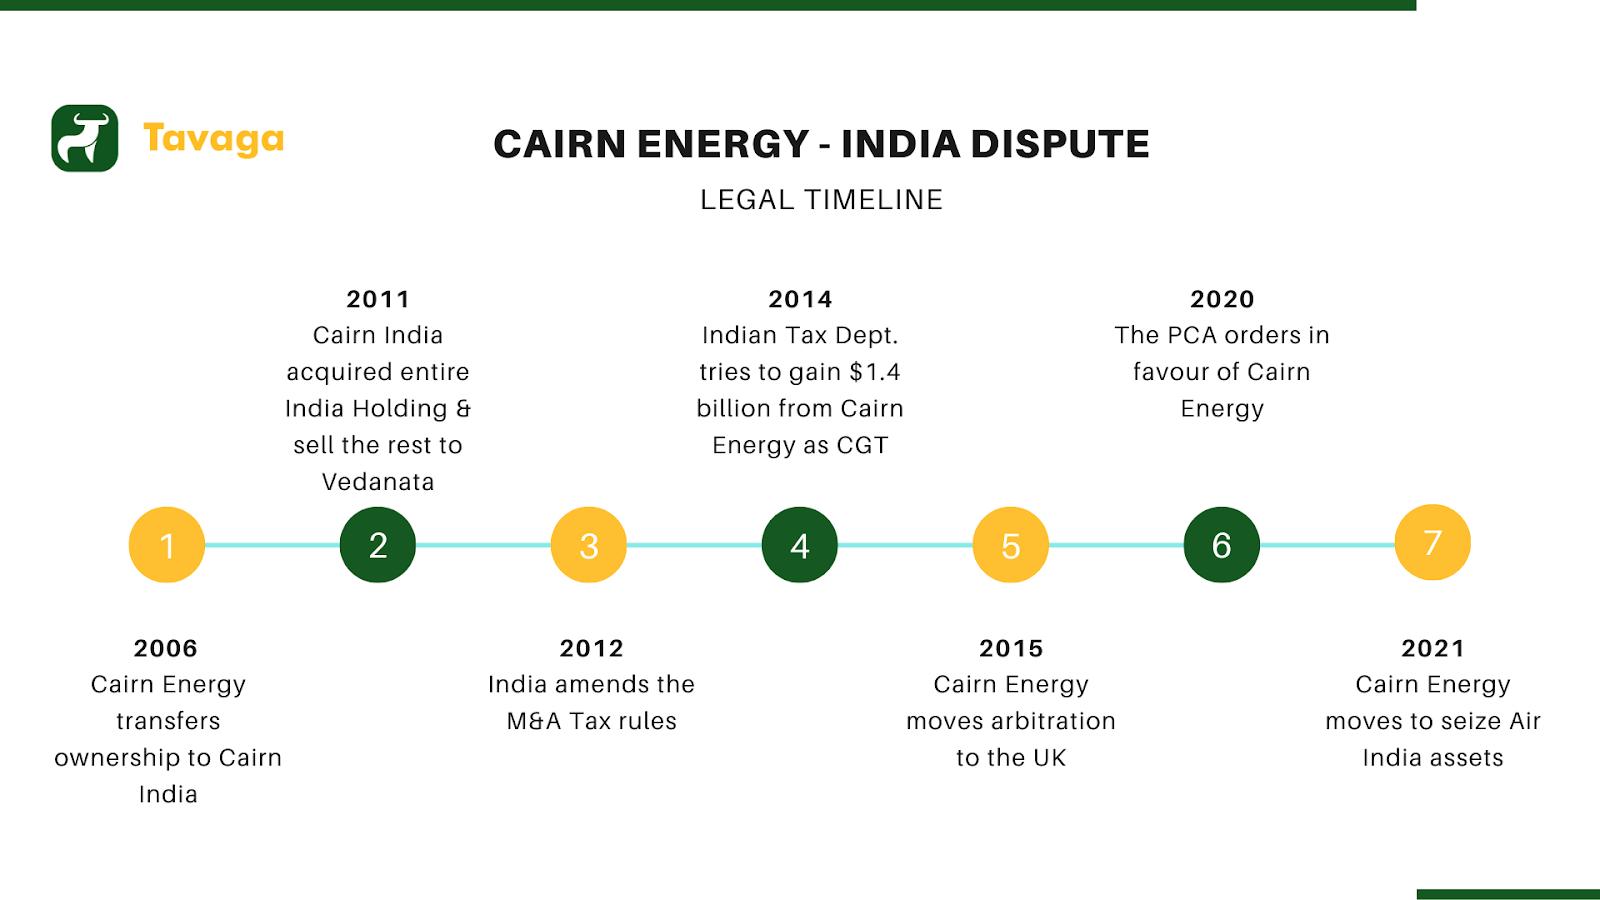 Cairn Energy - India dispute timeline